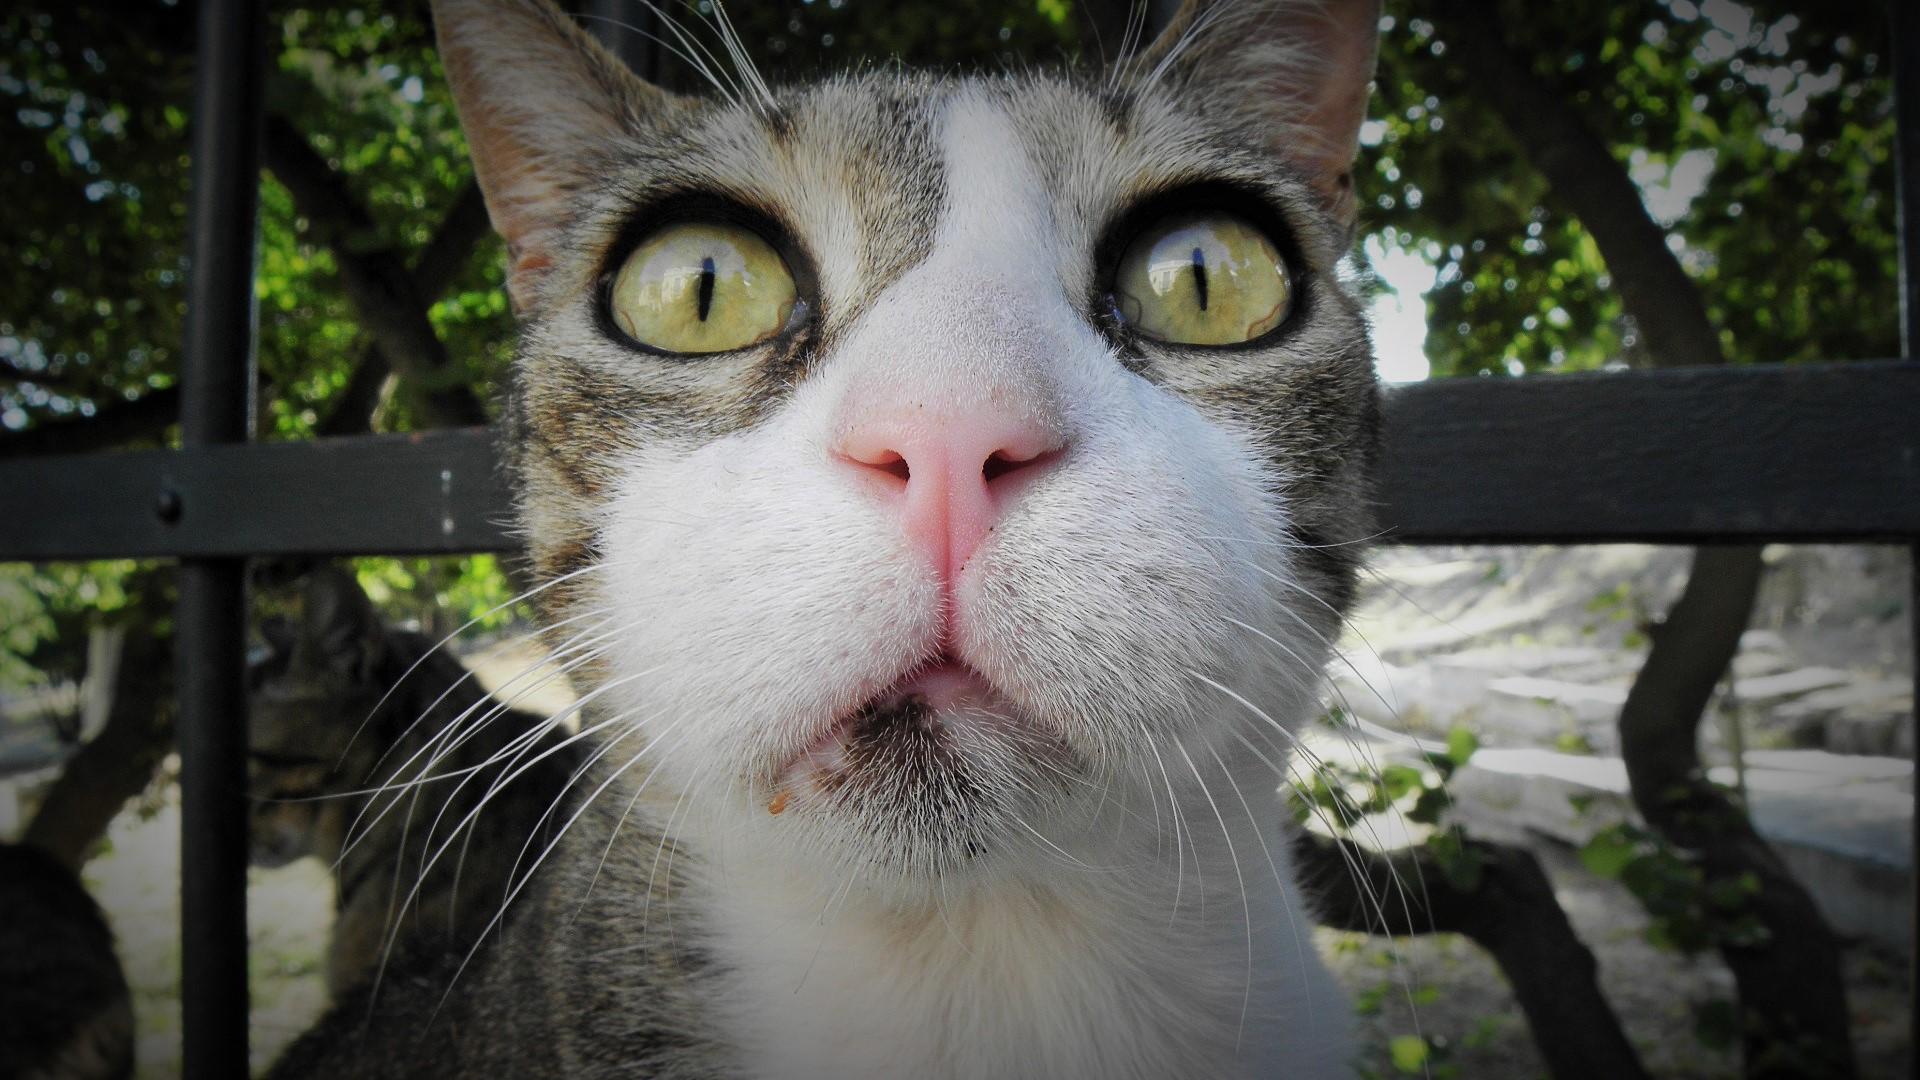 e47e8c3e4f22 Αυτό σημαίνει πως όσοι δεν συμπαθούν τις γάτες χρησιμοποιώντας το  επιχείρημα πως δεν εκπαιδεύονται ή πως είναι αντικοινωνικές